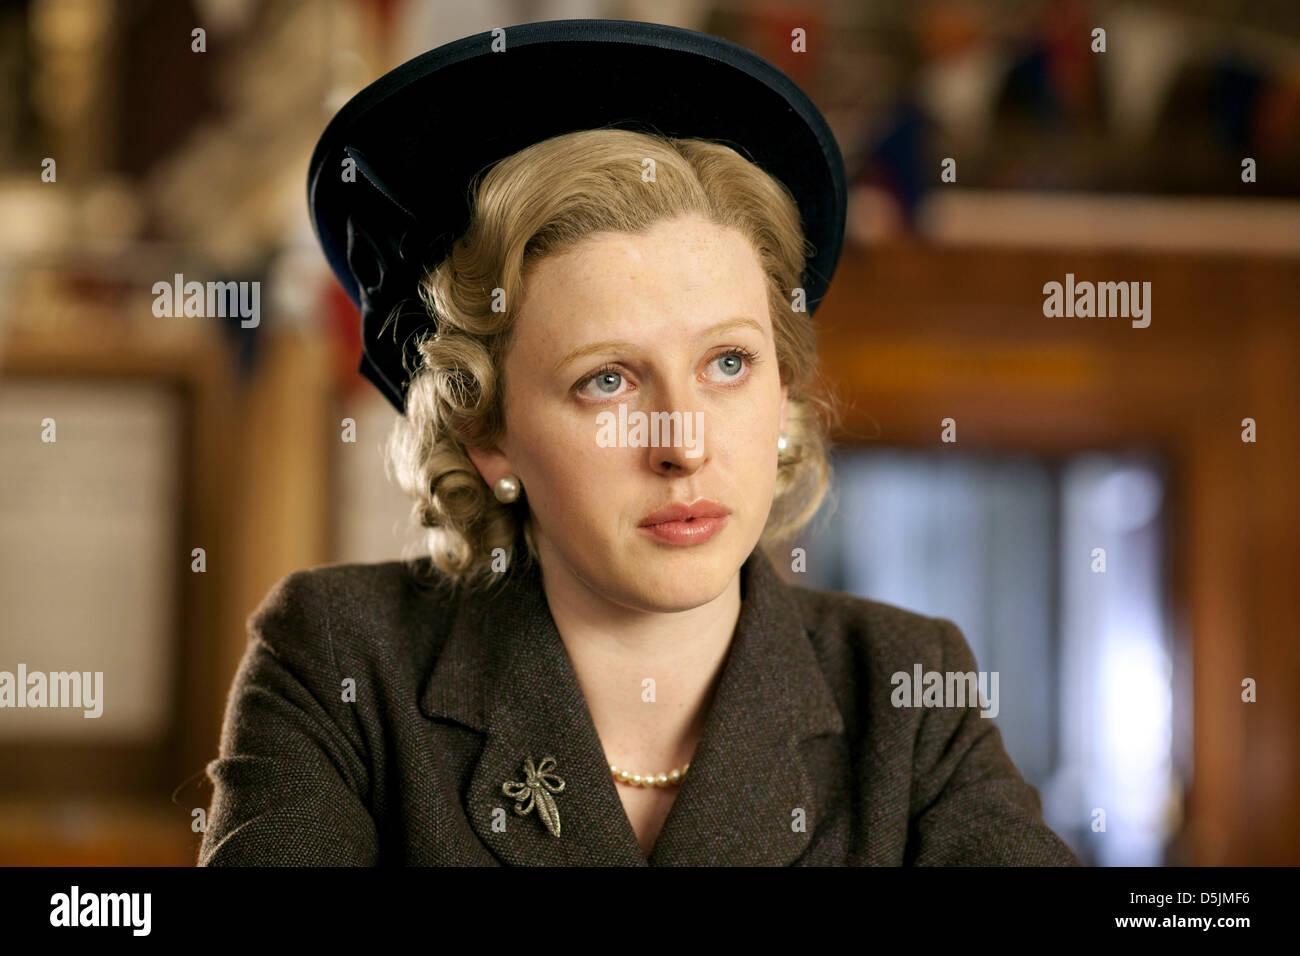 Robert Arden (1922?004 (naturalized American citizen),Janina Gavankar Sex archive Kendra Wilkinson United States,Gladys McConnell